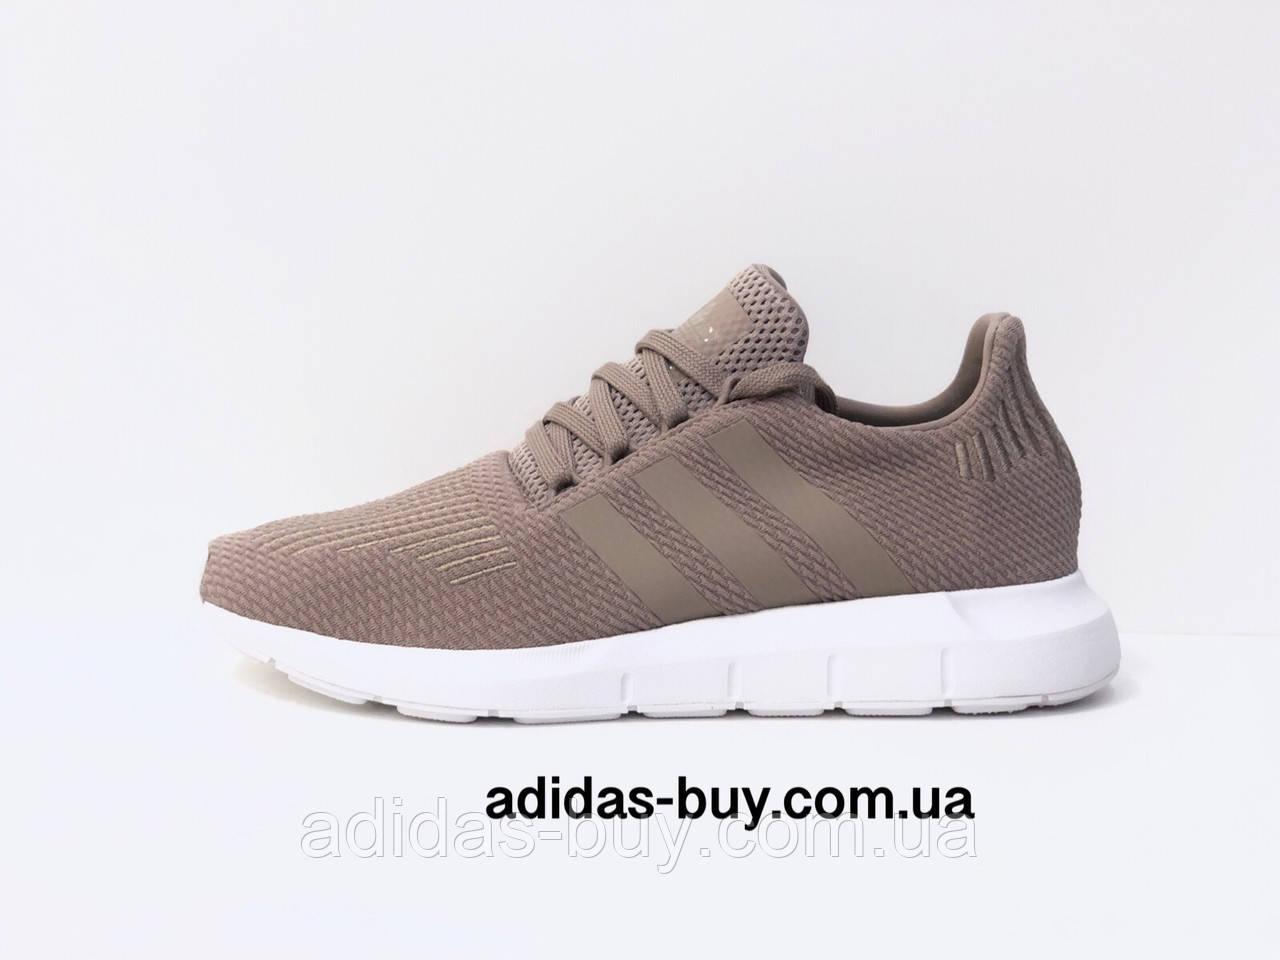 Кроссовки оригинал adidas женские Swift Run B37715 цвет: бежевый сезон: Весна/Лето